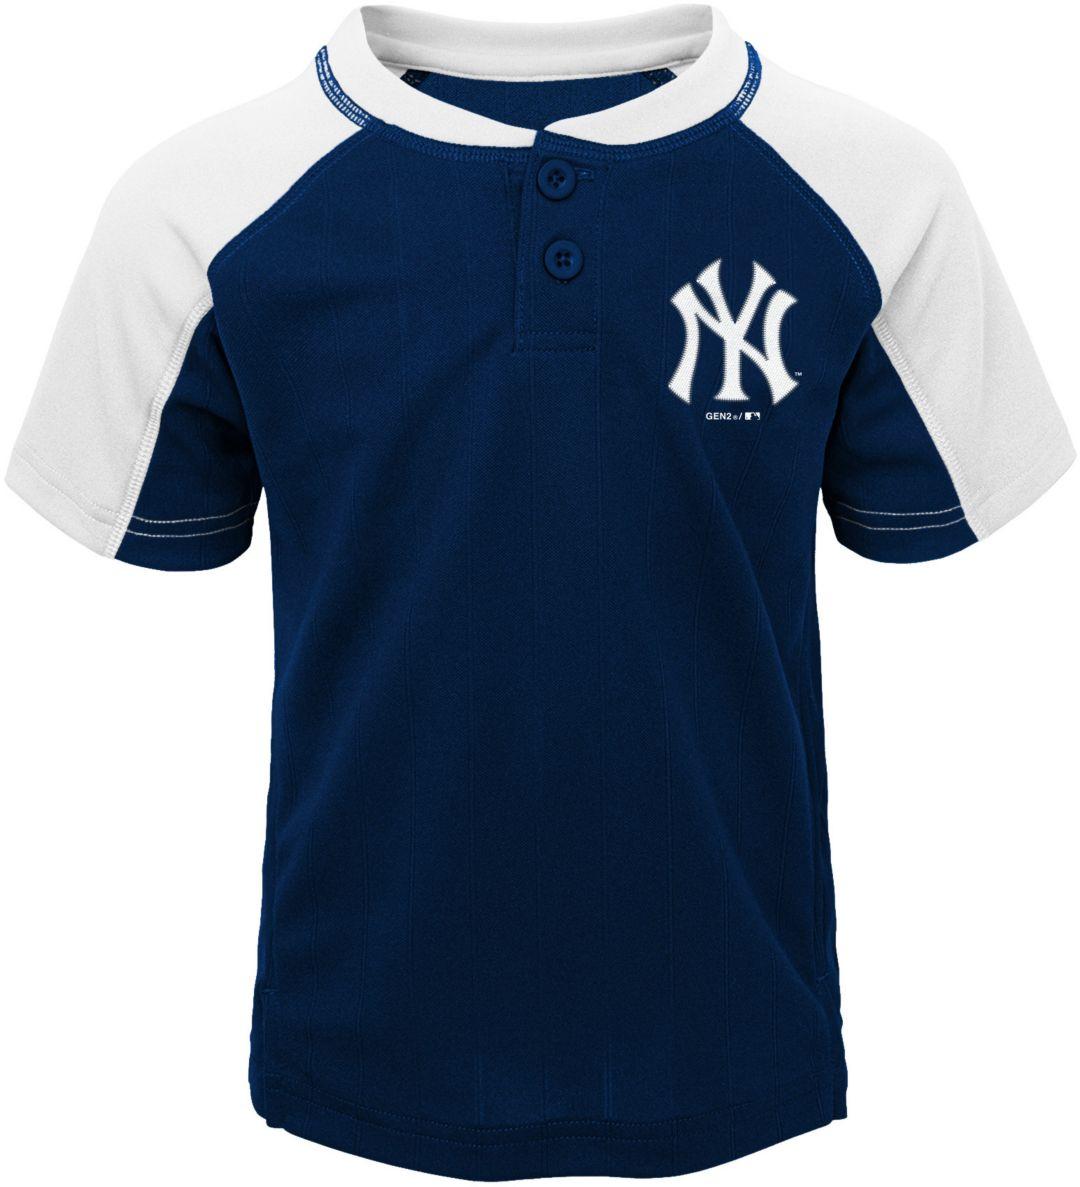 the best attitude 9ac47 423de Gen2 Toddler New York Yankees Shorts & Top Set